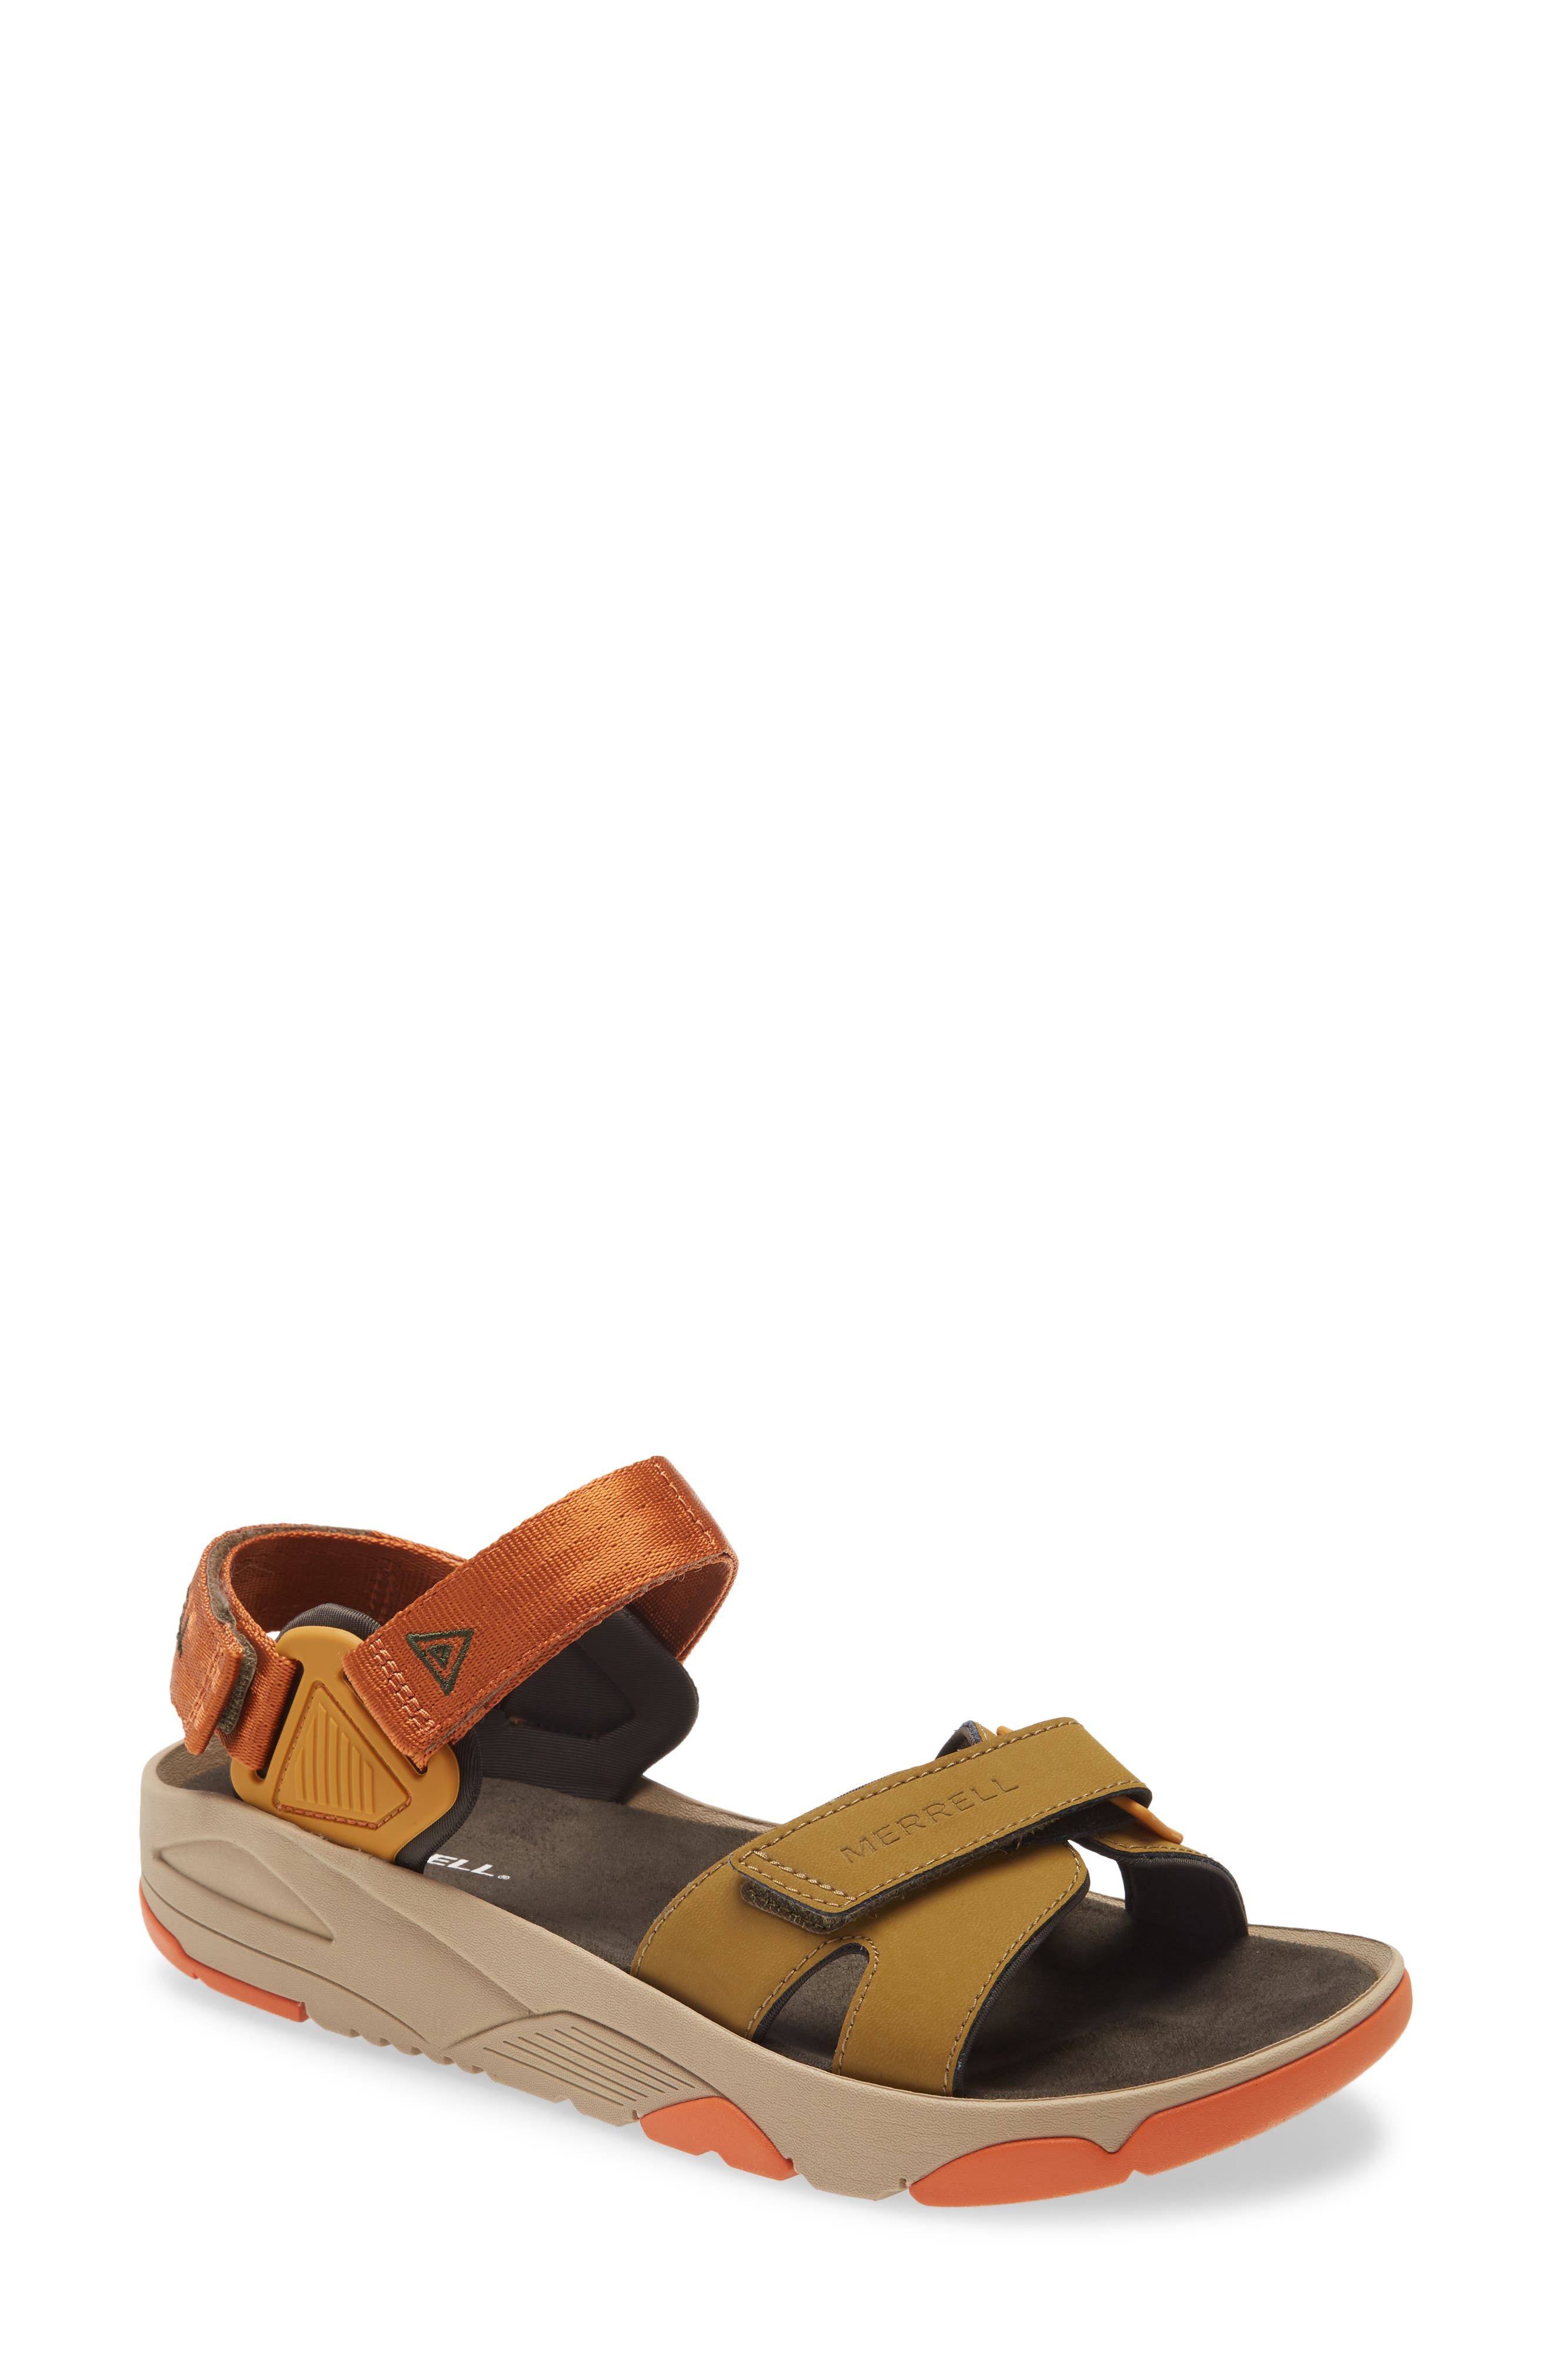 Image of Merrell Belize Convertible Strap Sandal